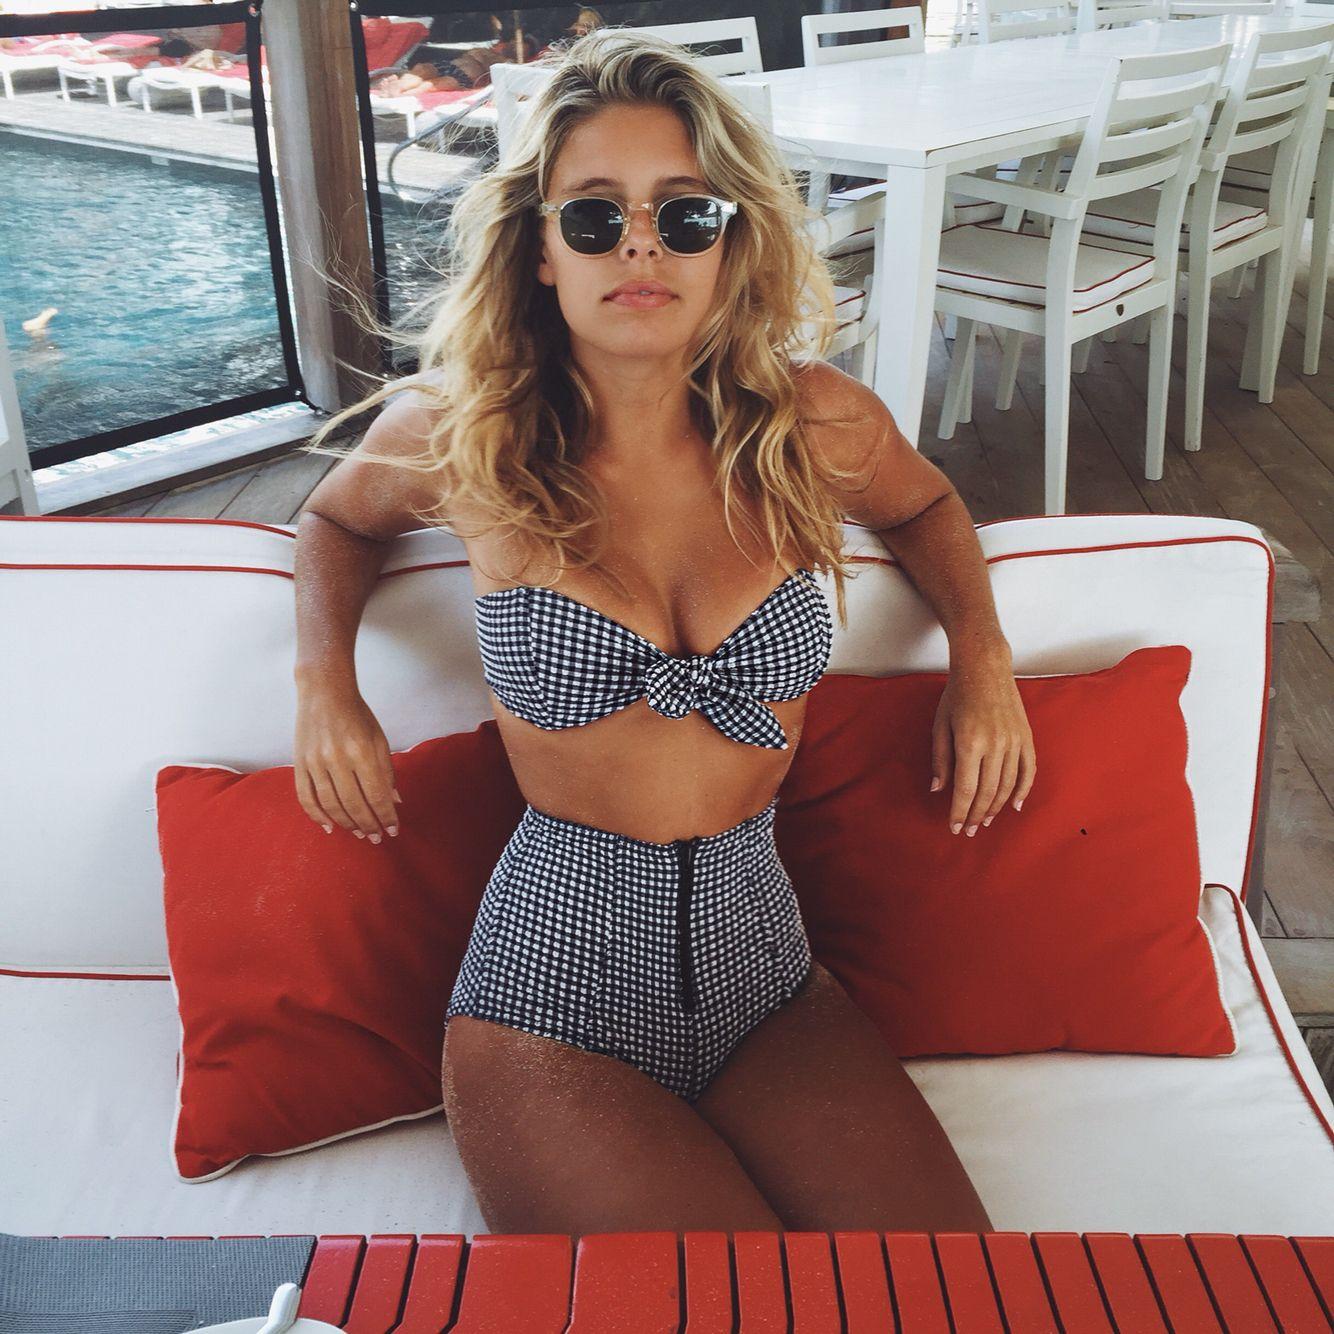 Bikini blogger Natasha Oakley shows off her curves in St Barts